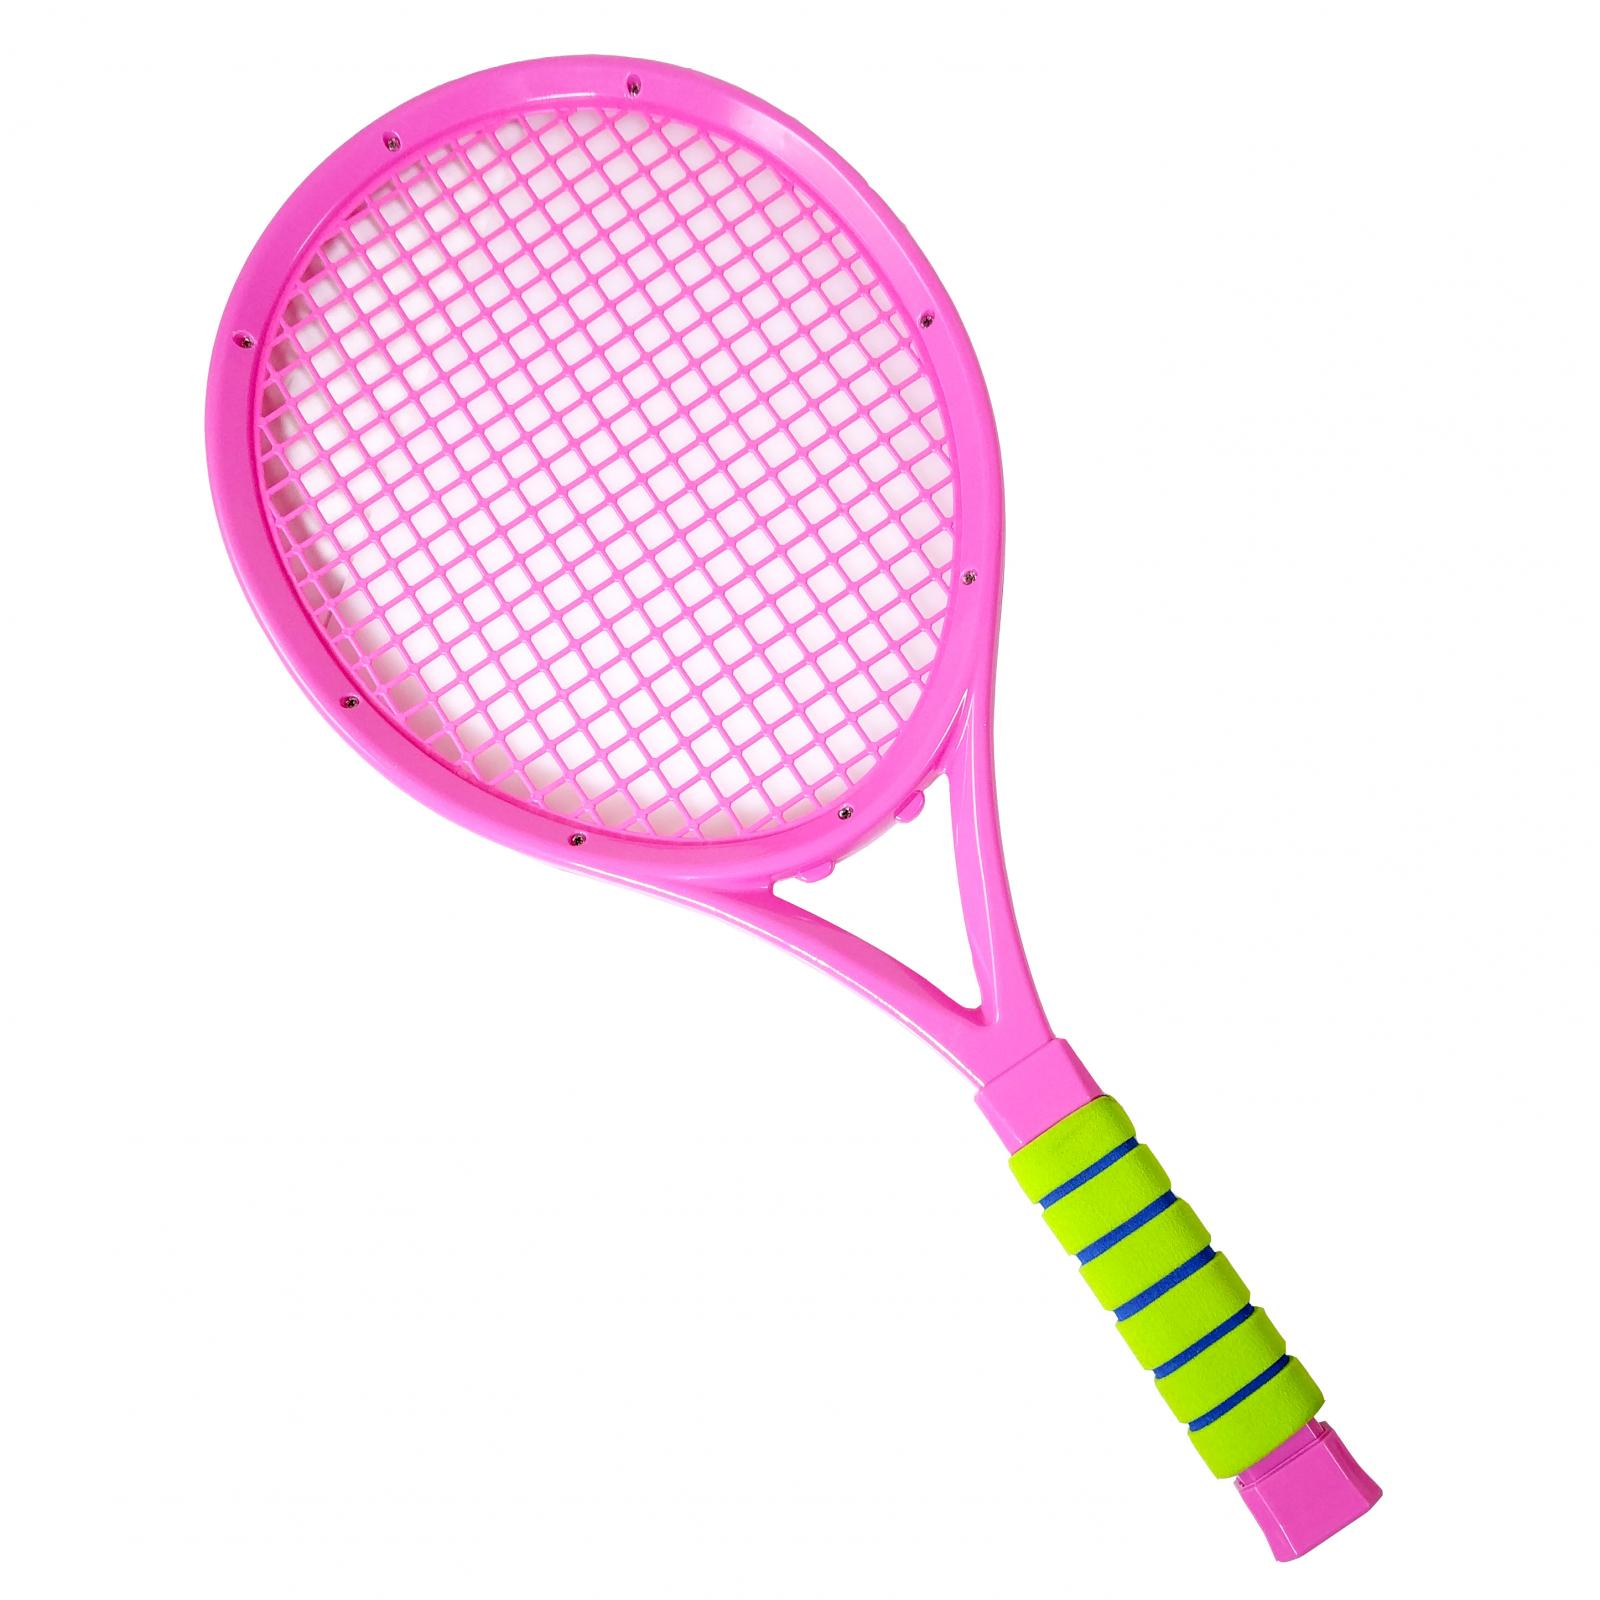 TychoTyke Kids Tennis Rackets Outdoor Exercise - Pink